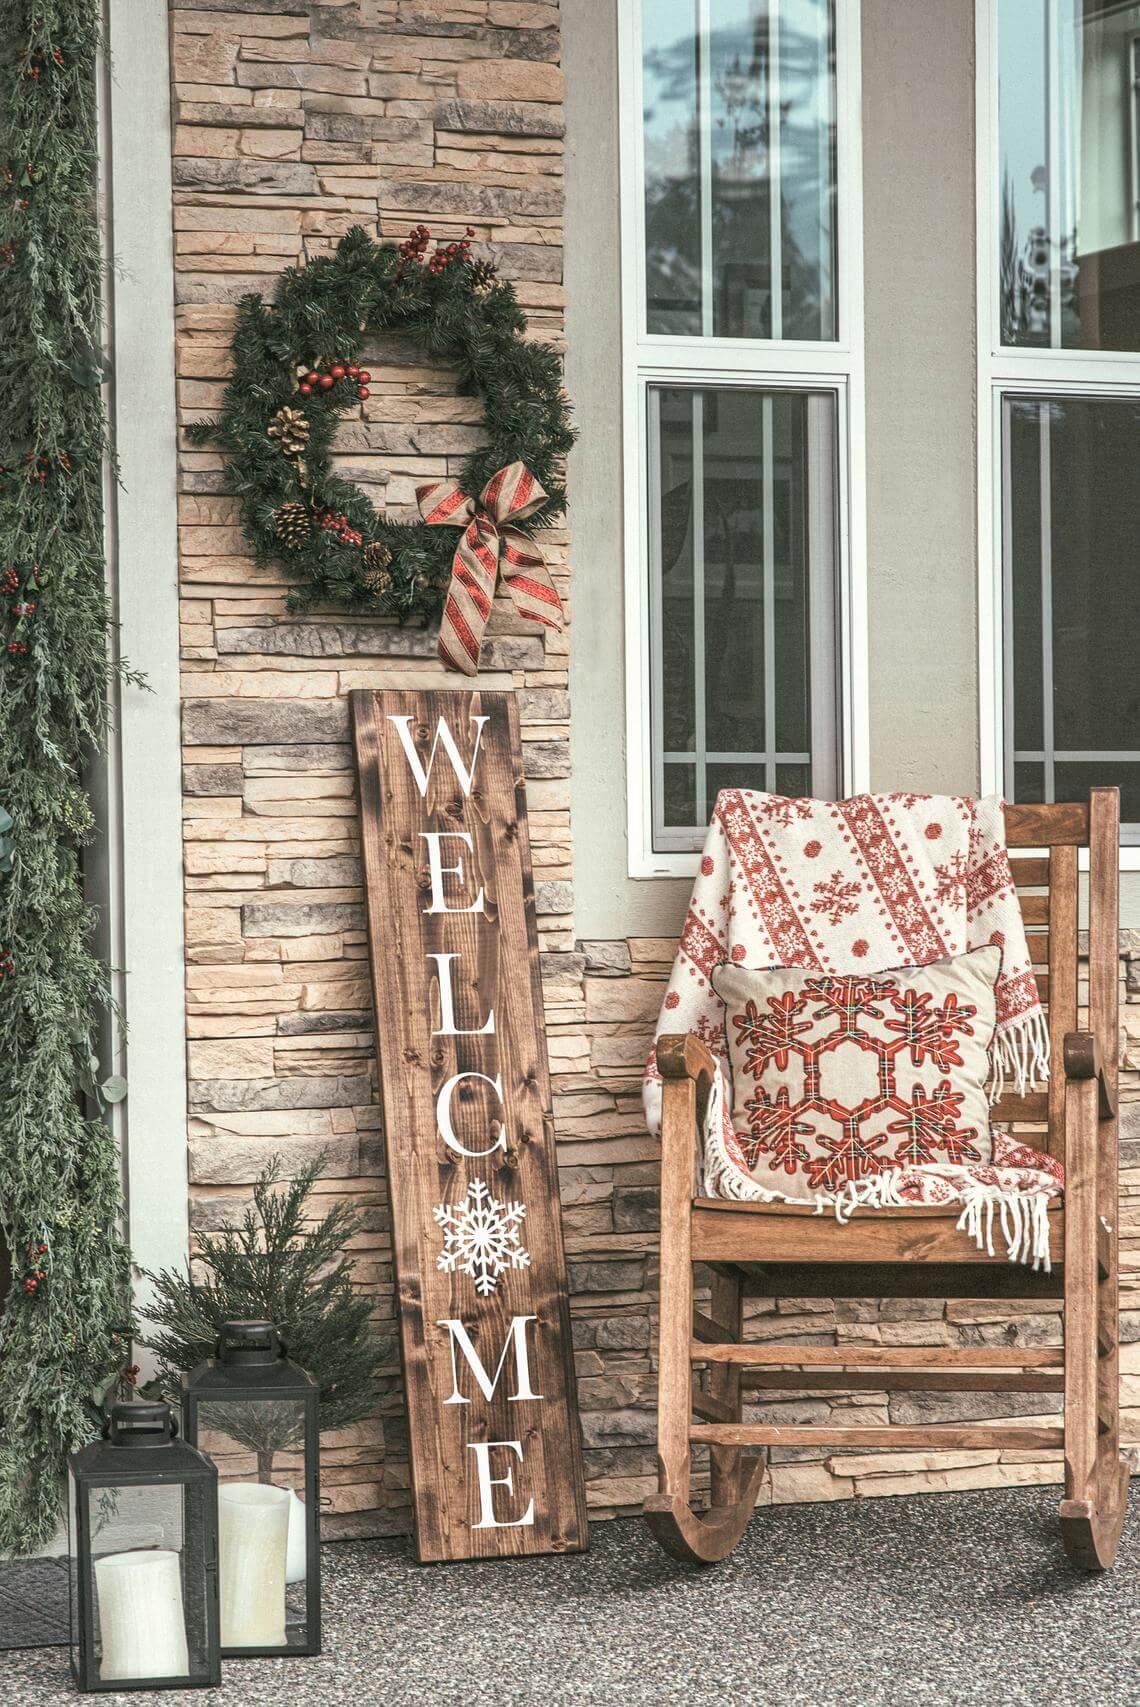 Snowflake Welcoming Vertical Christmas Sign